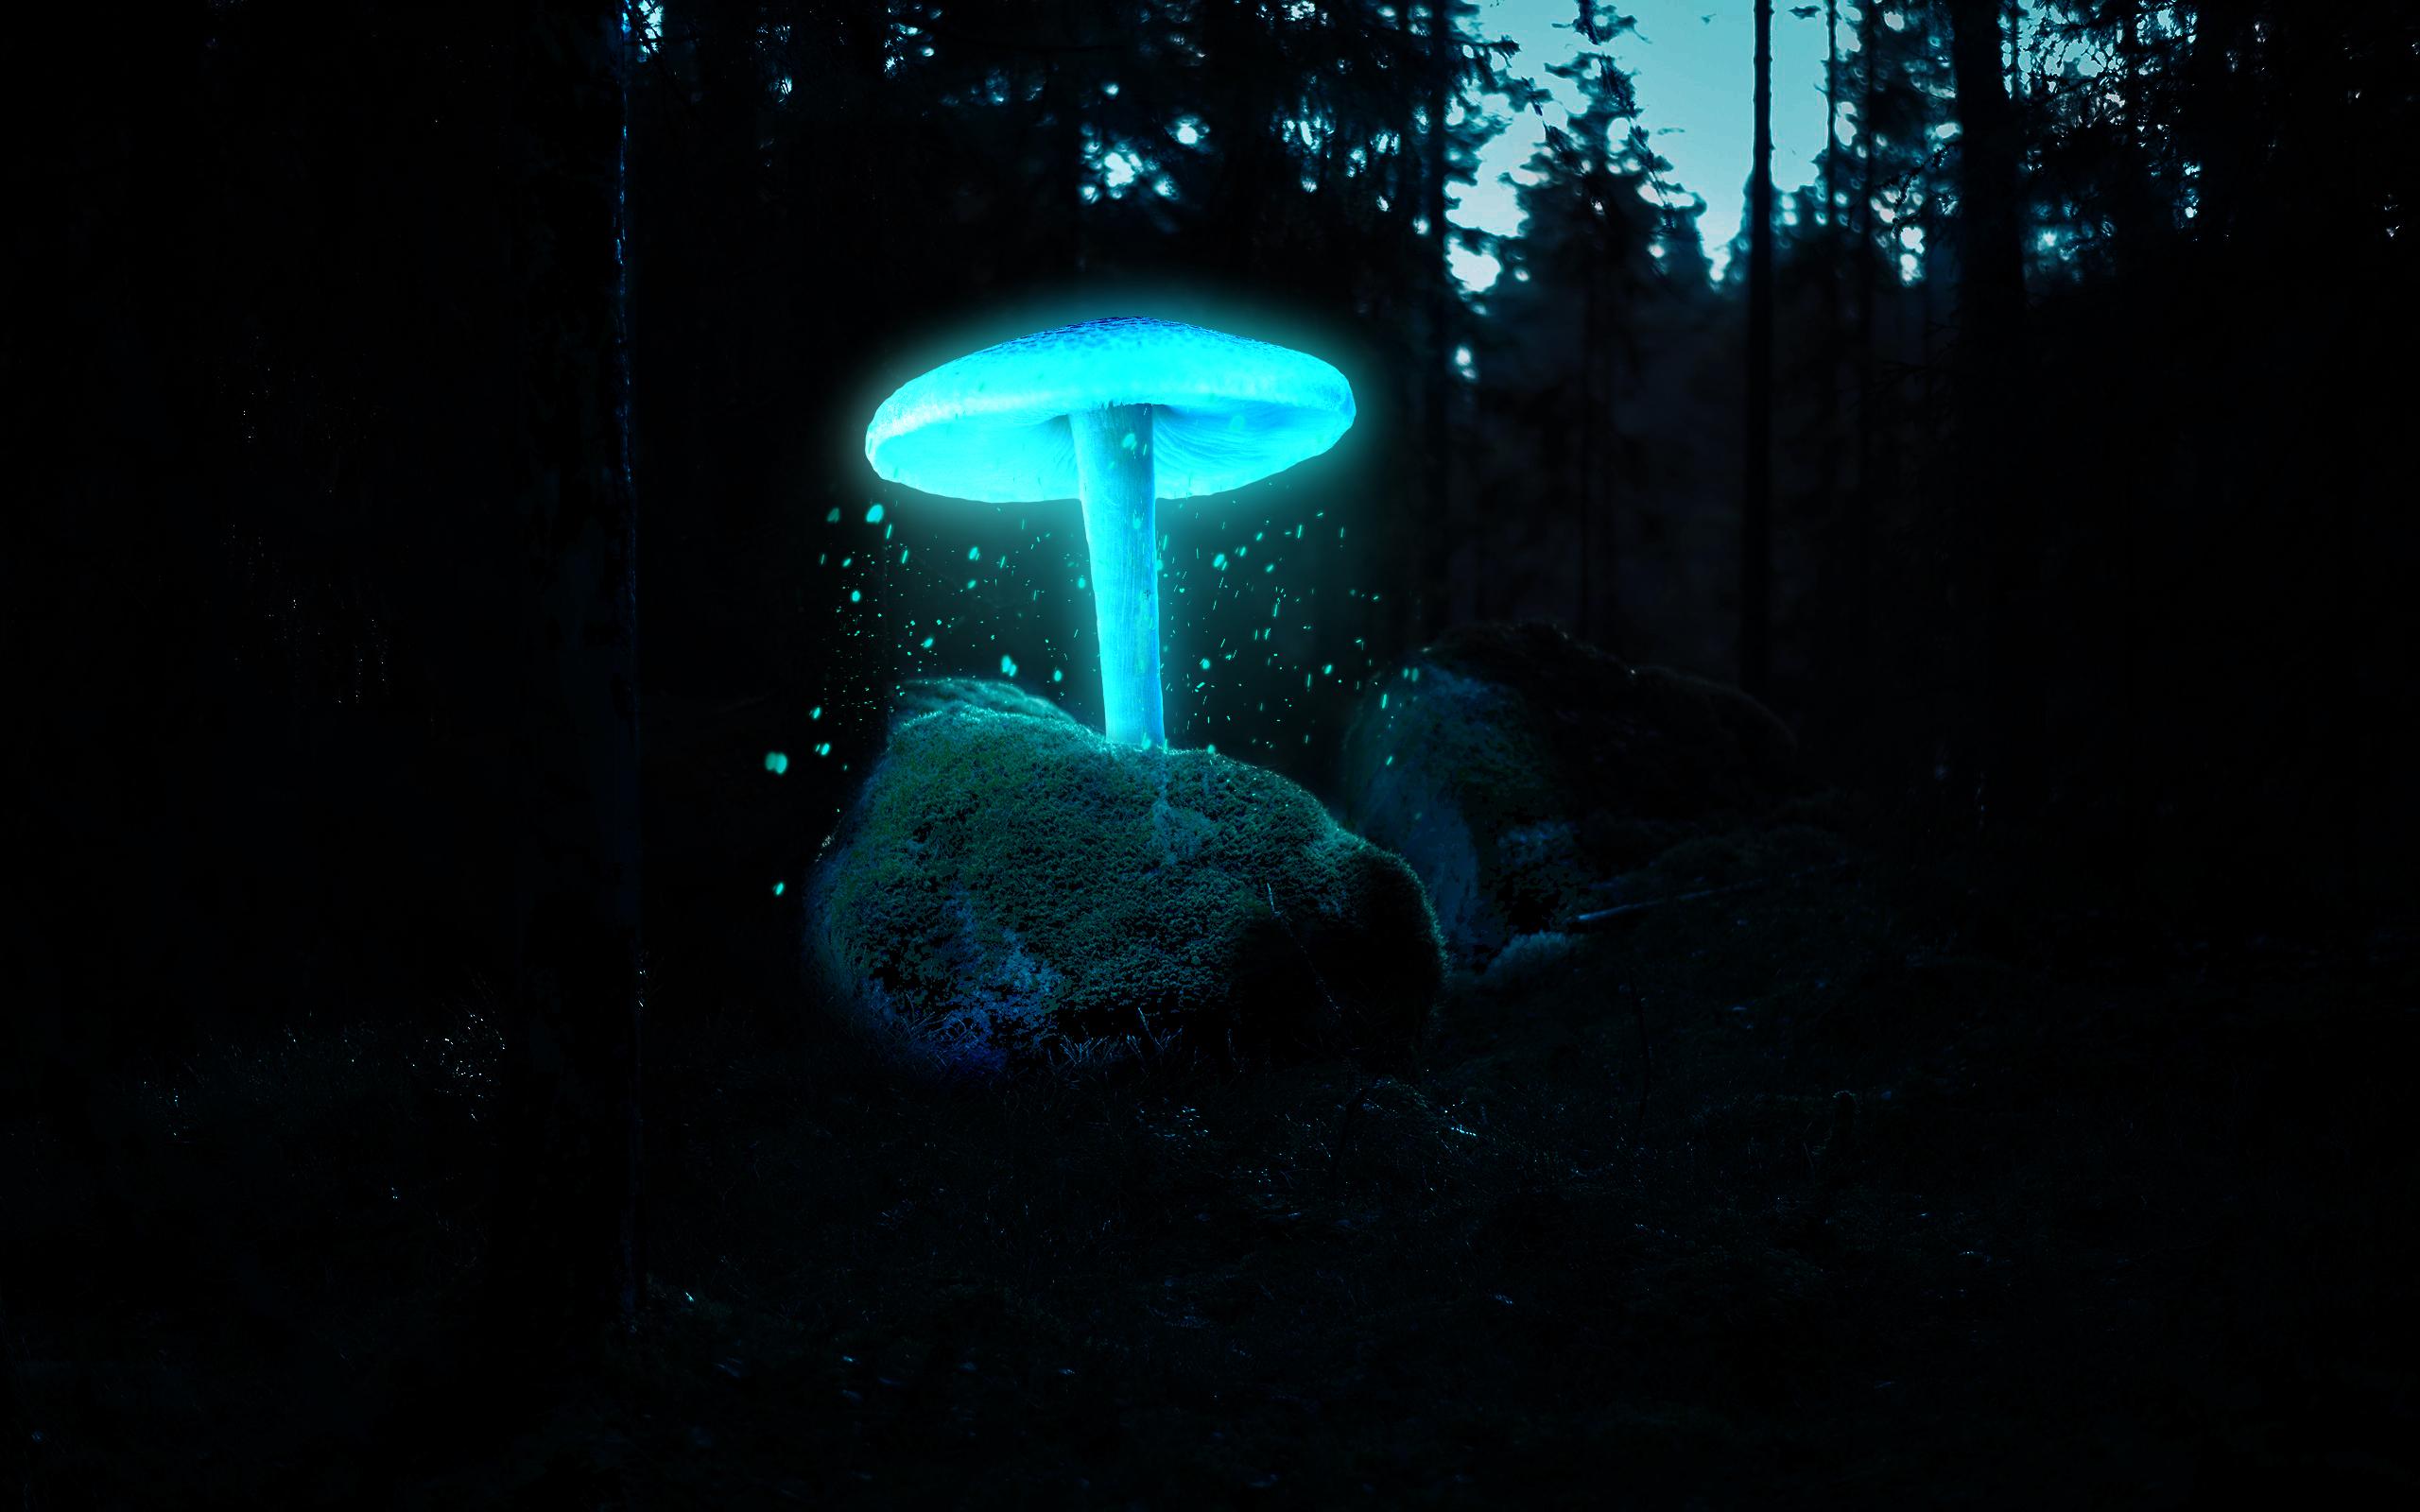 neon blue 1851407